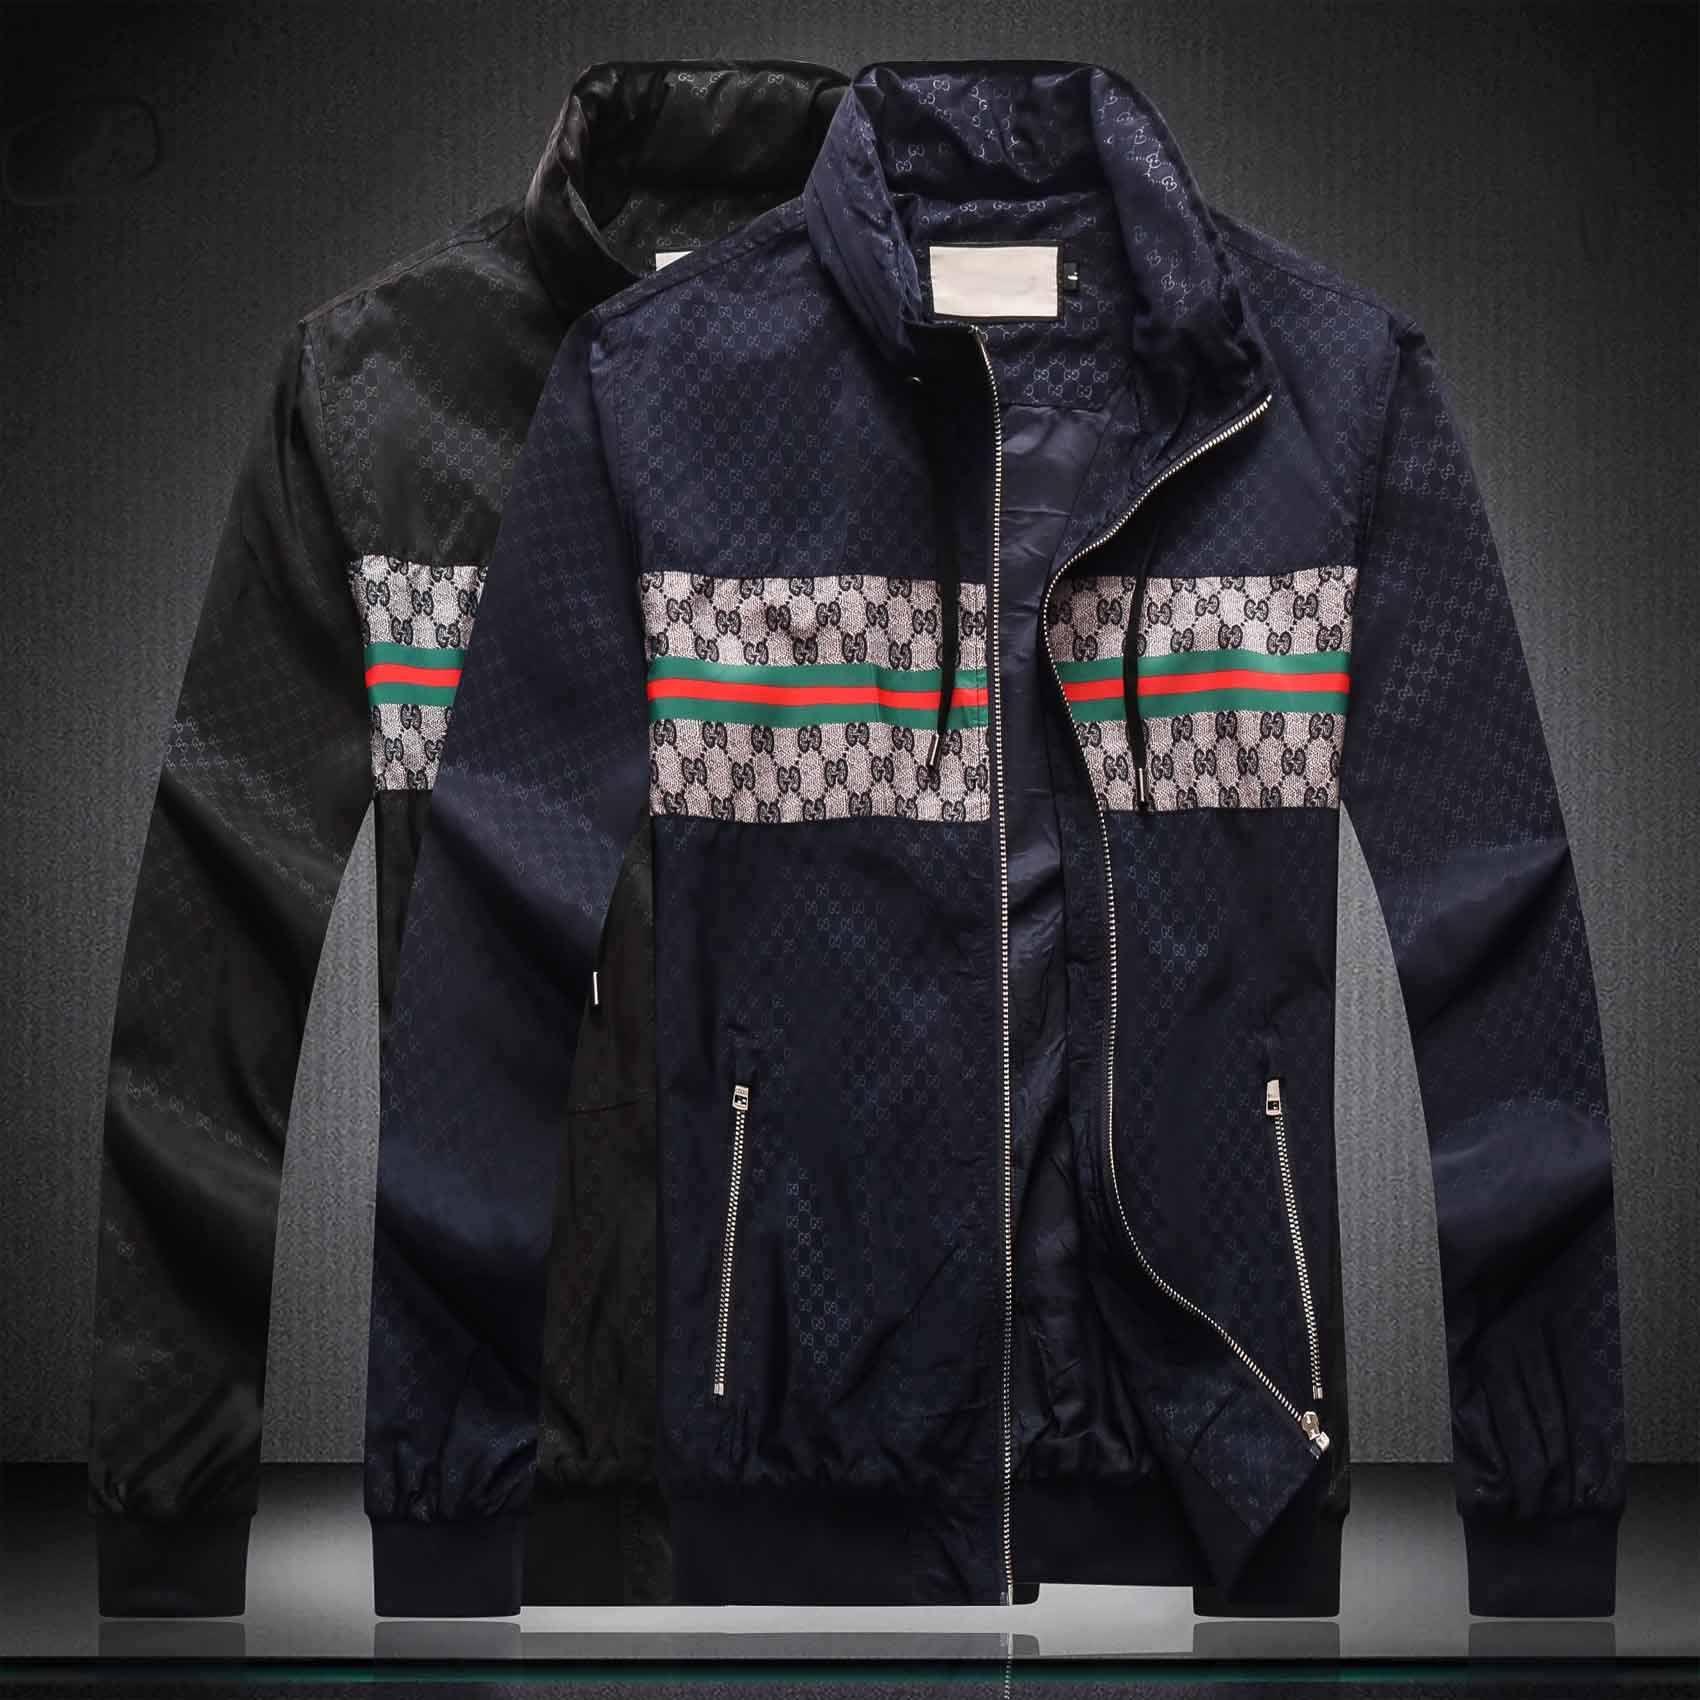 Mens Designer-Jacke mit Kapuze Frühlings-Herbst-Marke Zipper Windbreaker Letters Druck für Männer und Frauen Luxus-Mantel-Jacke